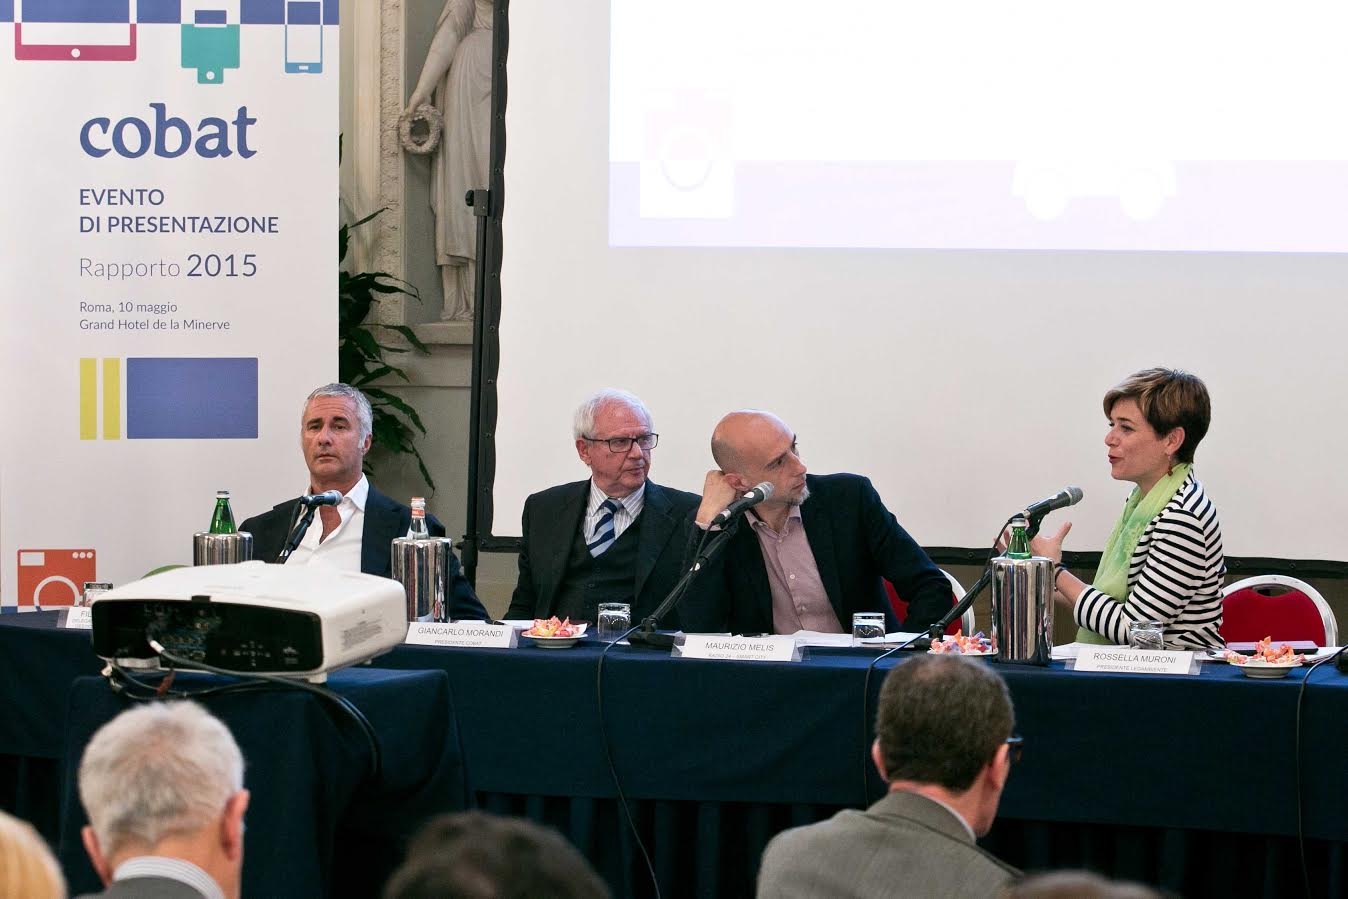 COBAT Giancarlo Morandi presidente Cobat e i relatori